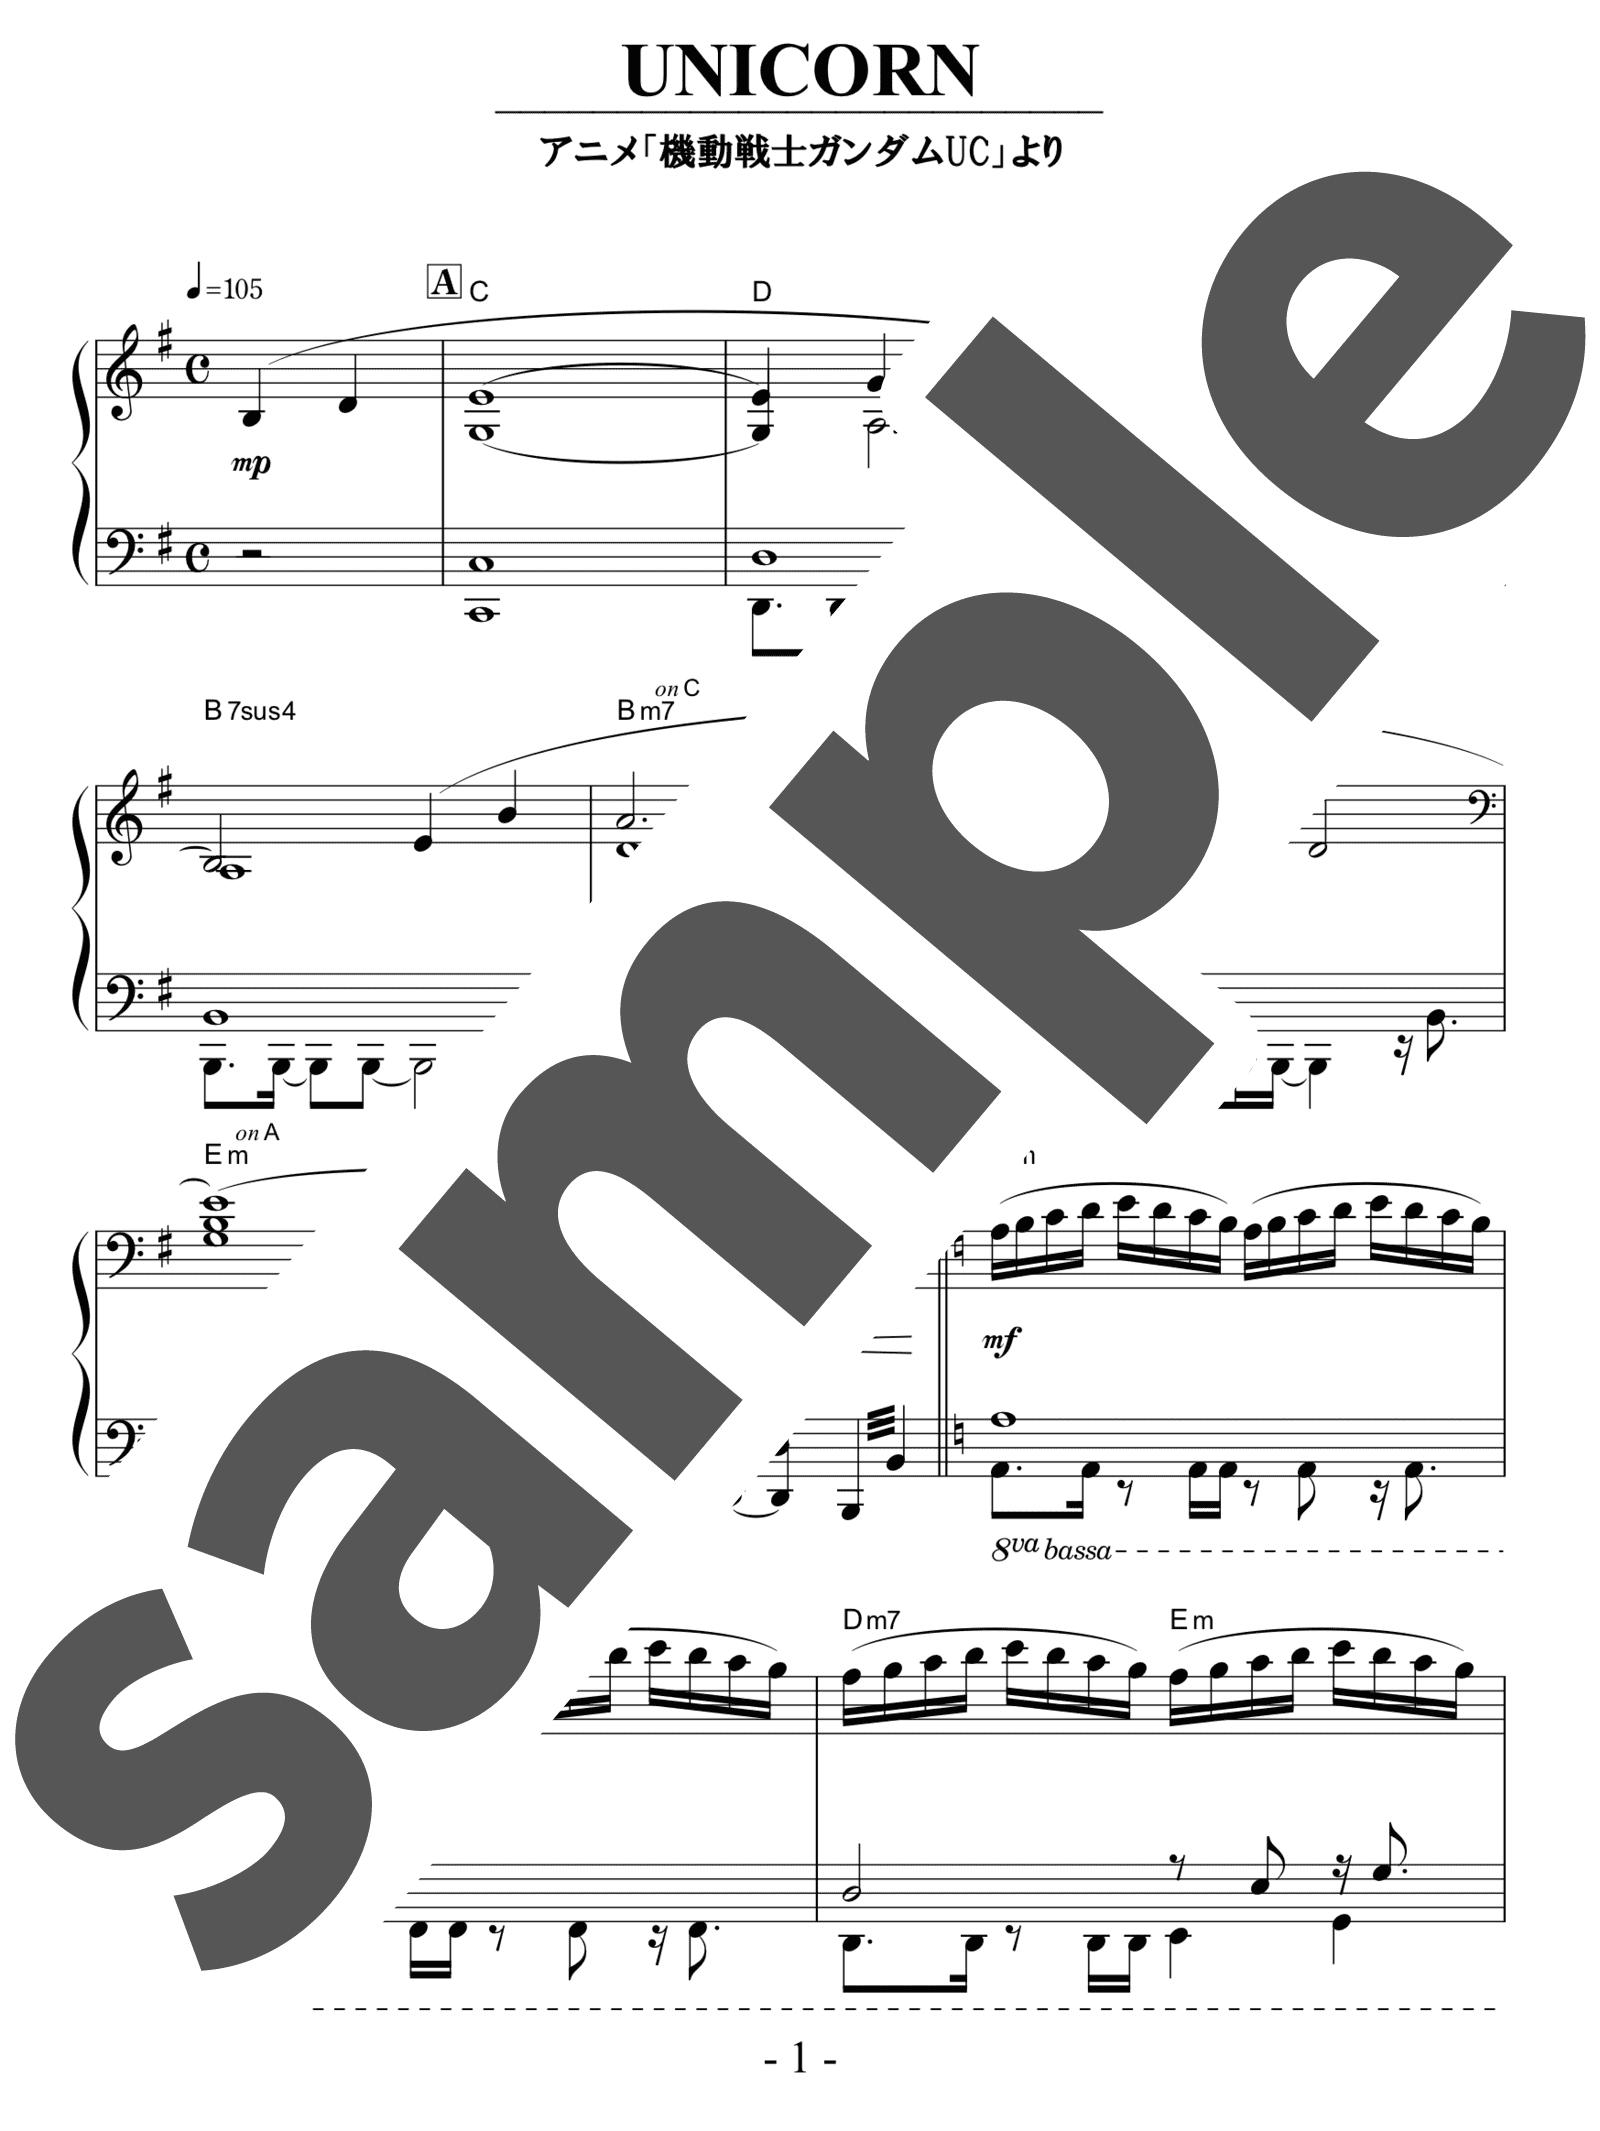 「UNICORN」のサンプル楽譜